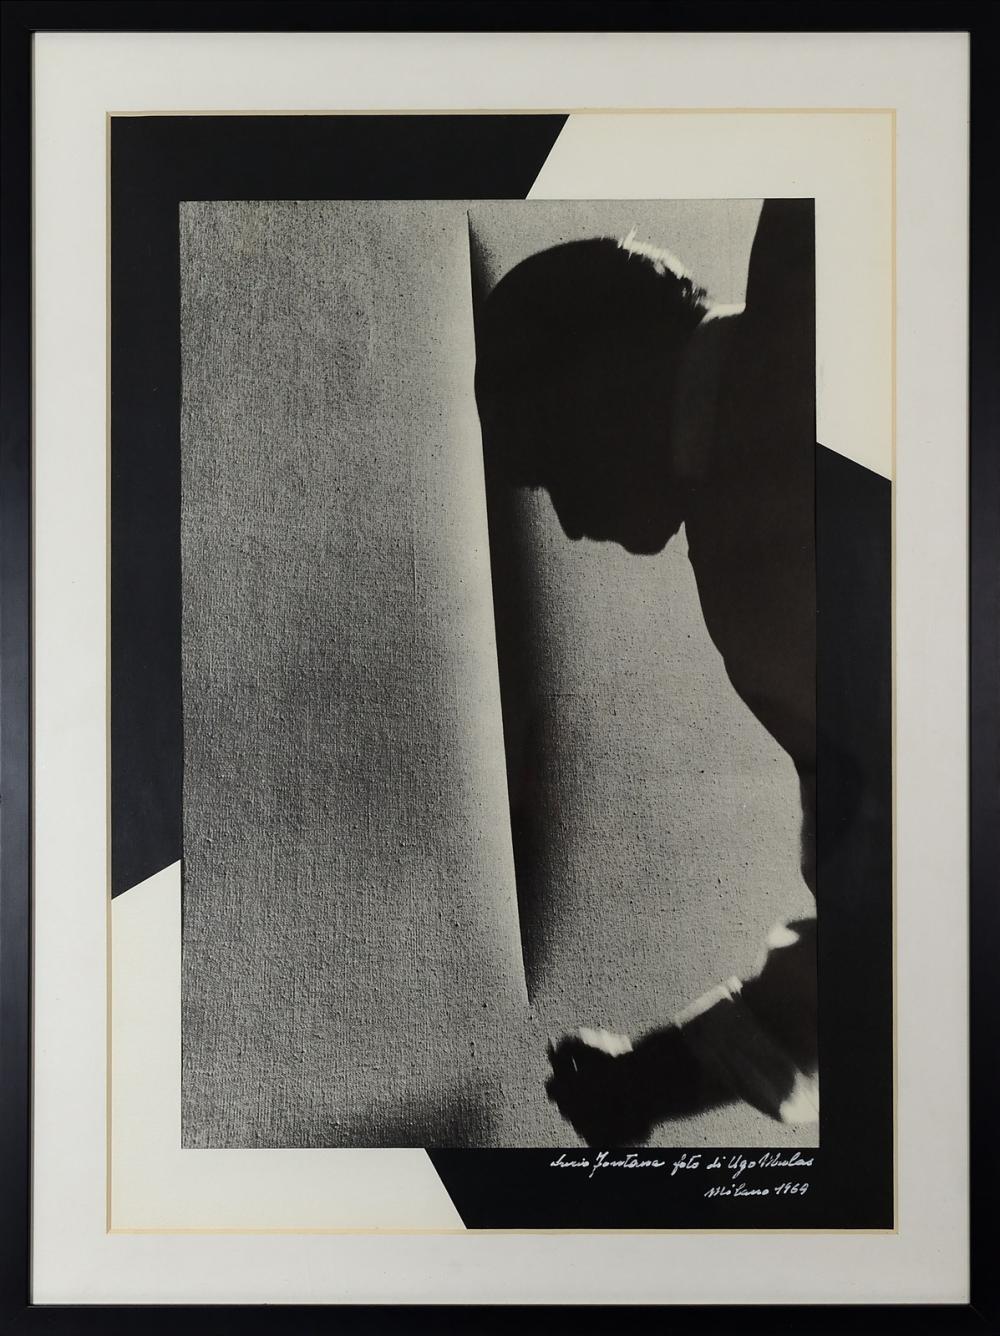 MULAS UGO (1928 - 1973) Lucio Fontana picture, Milan 1969.